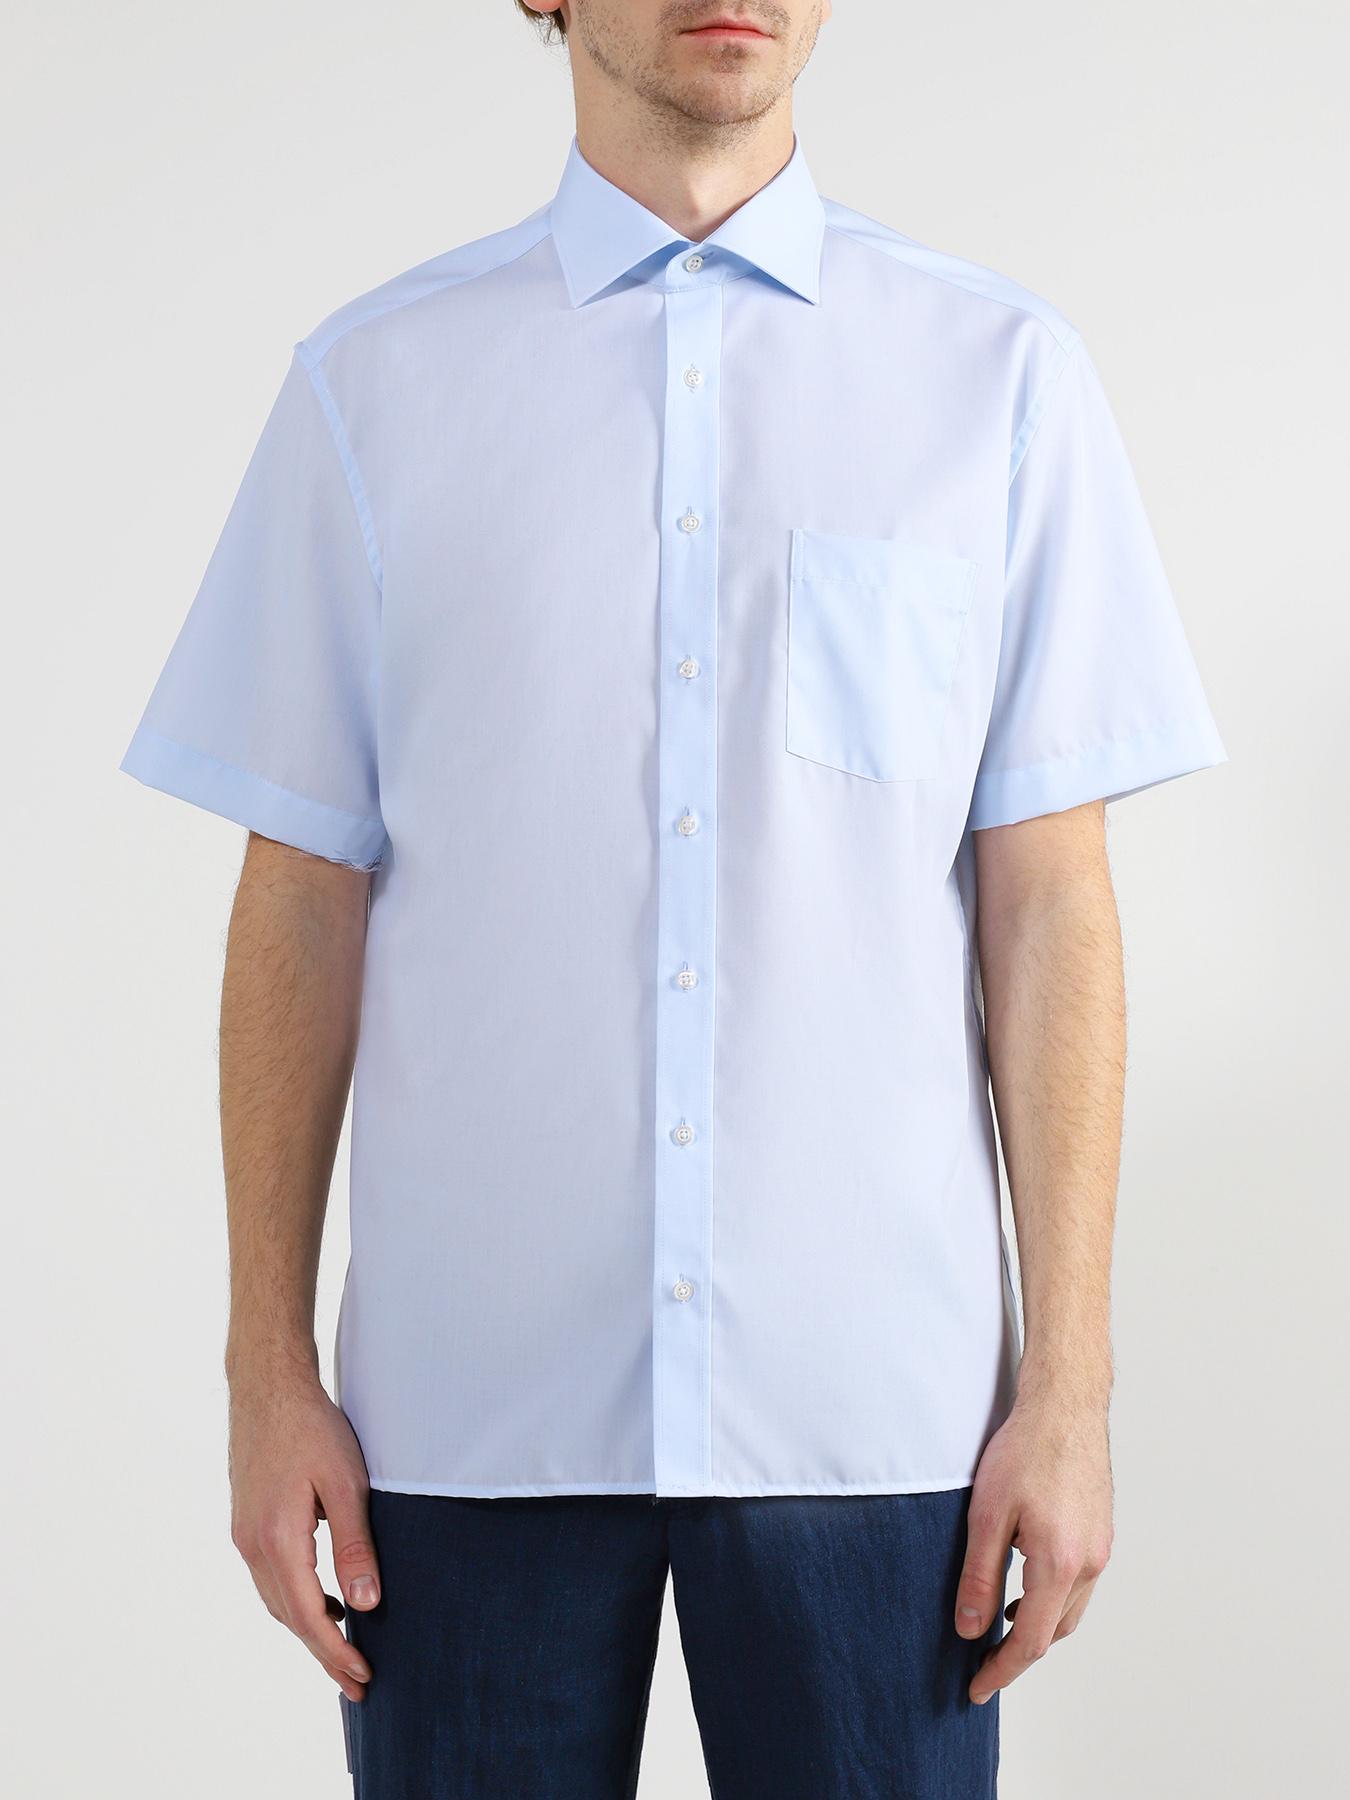 Рубашки Eterna Мужская рубашка рубашка мужская ancient sharks y23412700 23412700